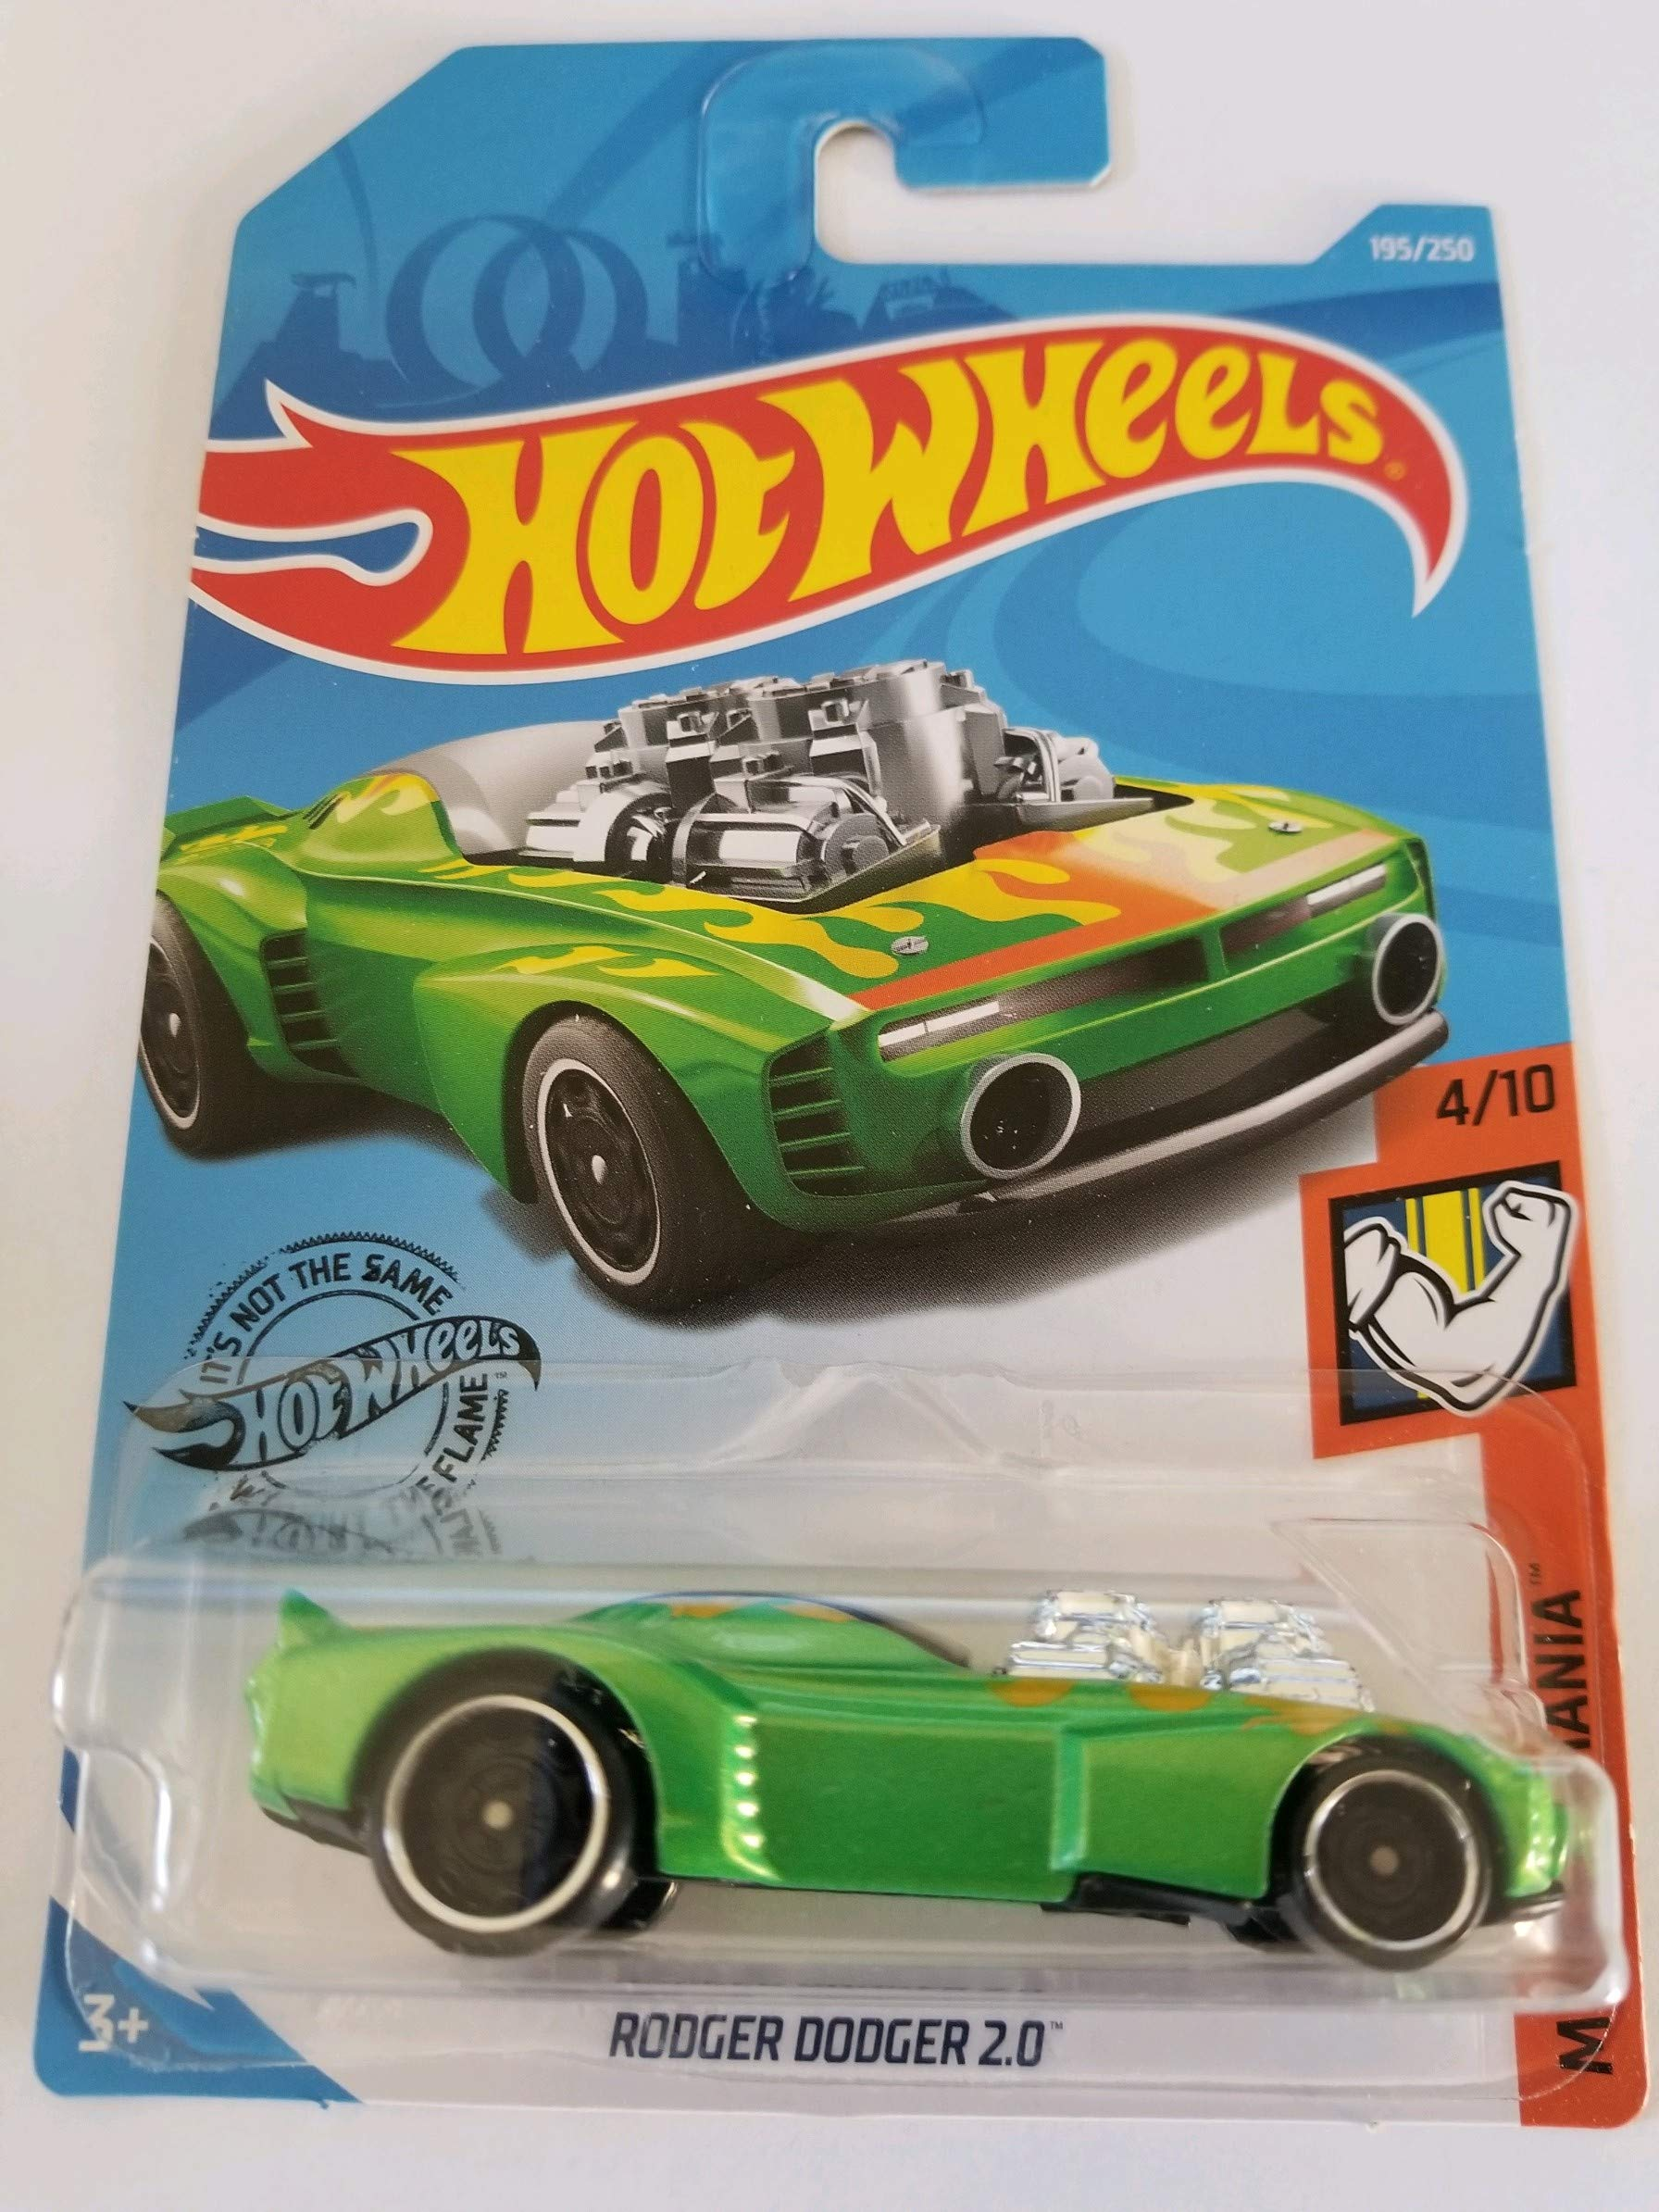 Hot Wheels 2019 Muscle Mania Rodger Dodger 2.0, 195/250 Verde